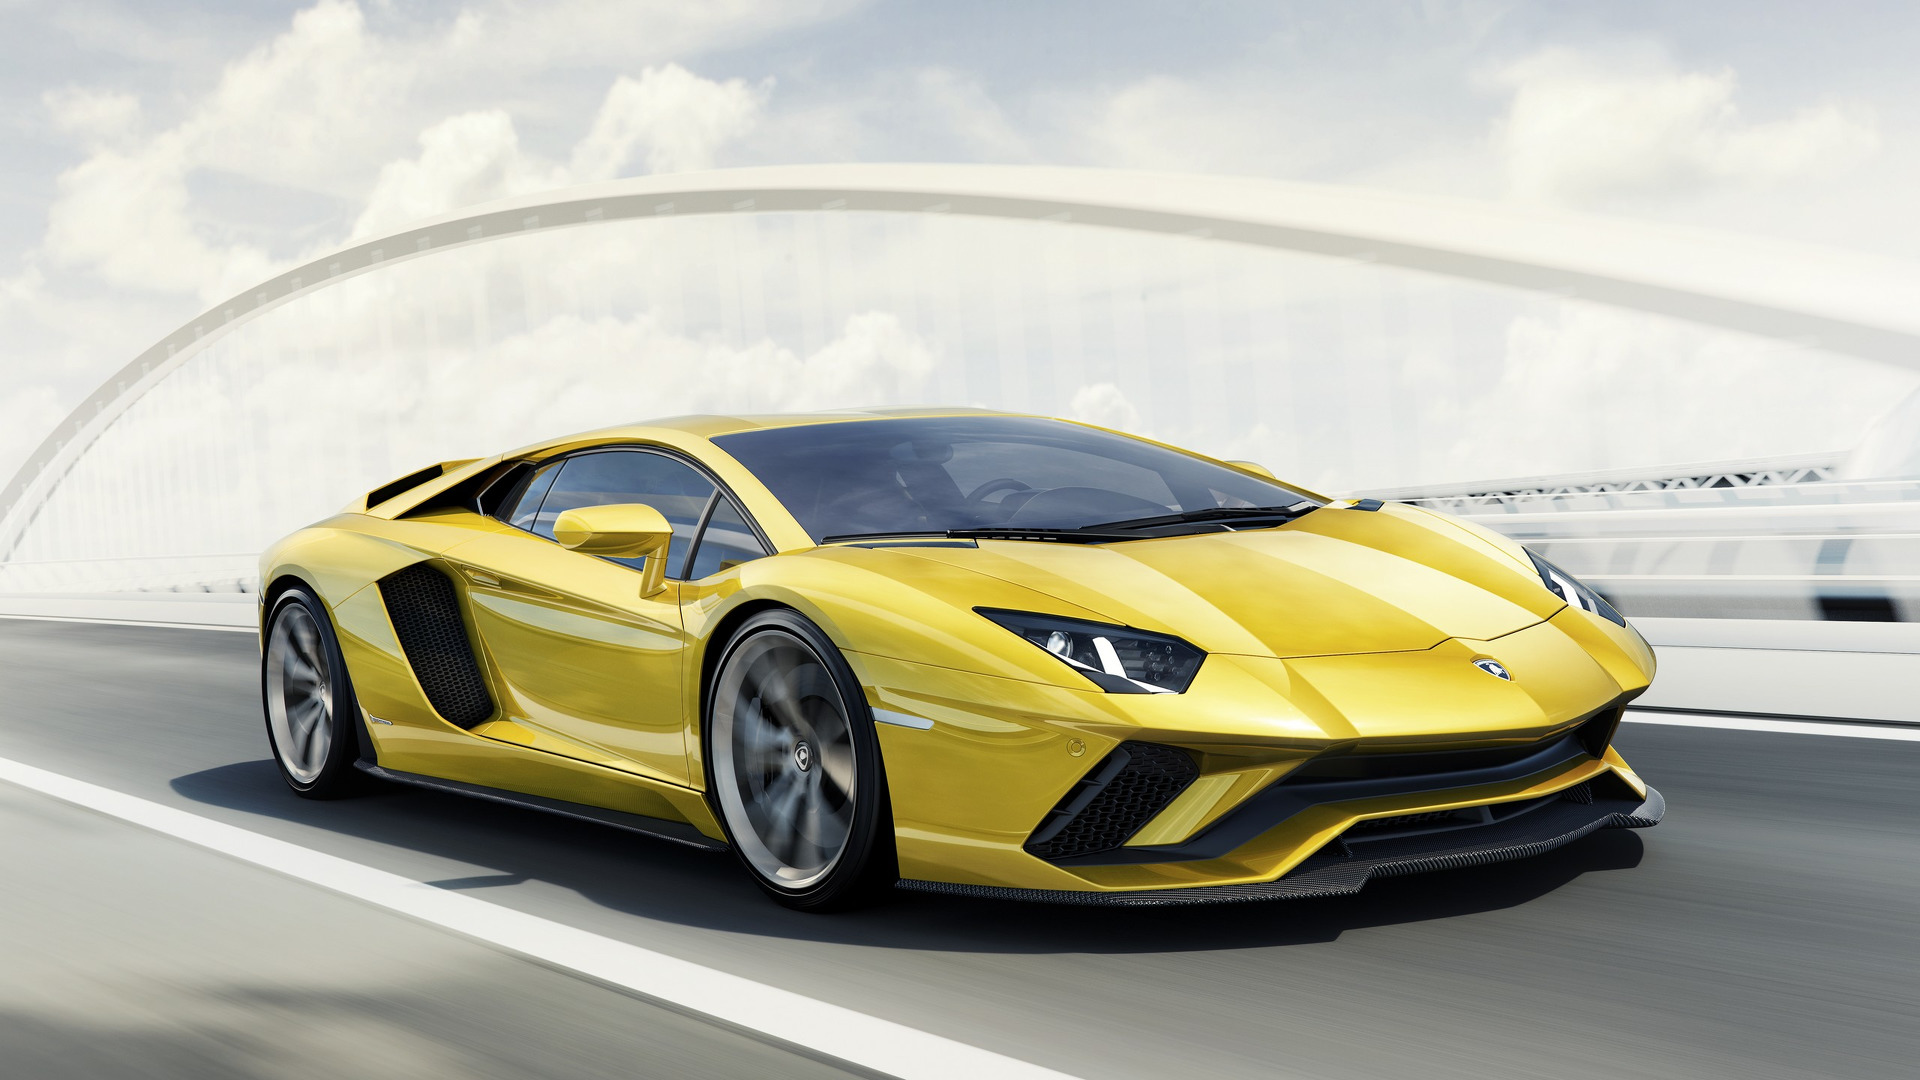 Lamborghini Aventador S Detailed In Five Official Videos